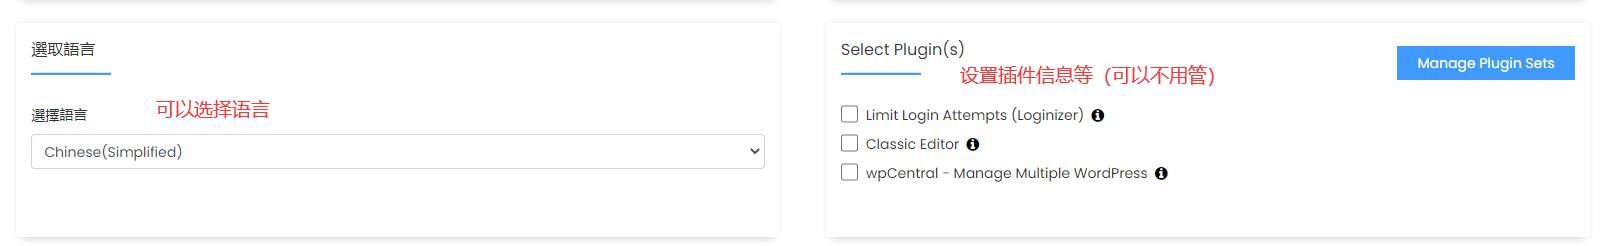 Bluehost使用教程 - WordPress安装 - 语言和插件